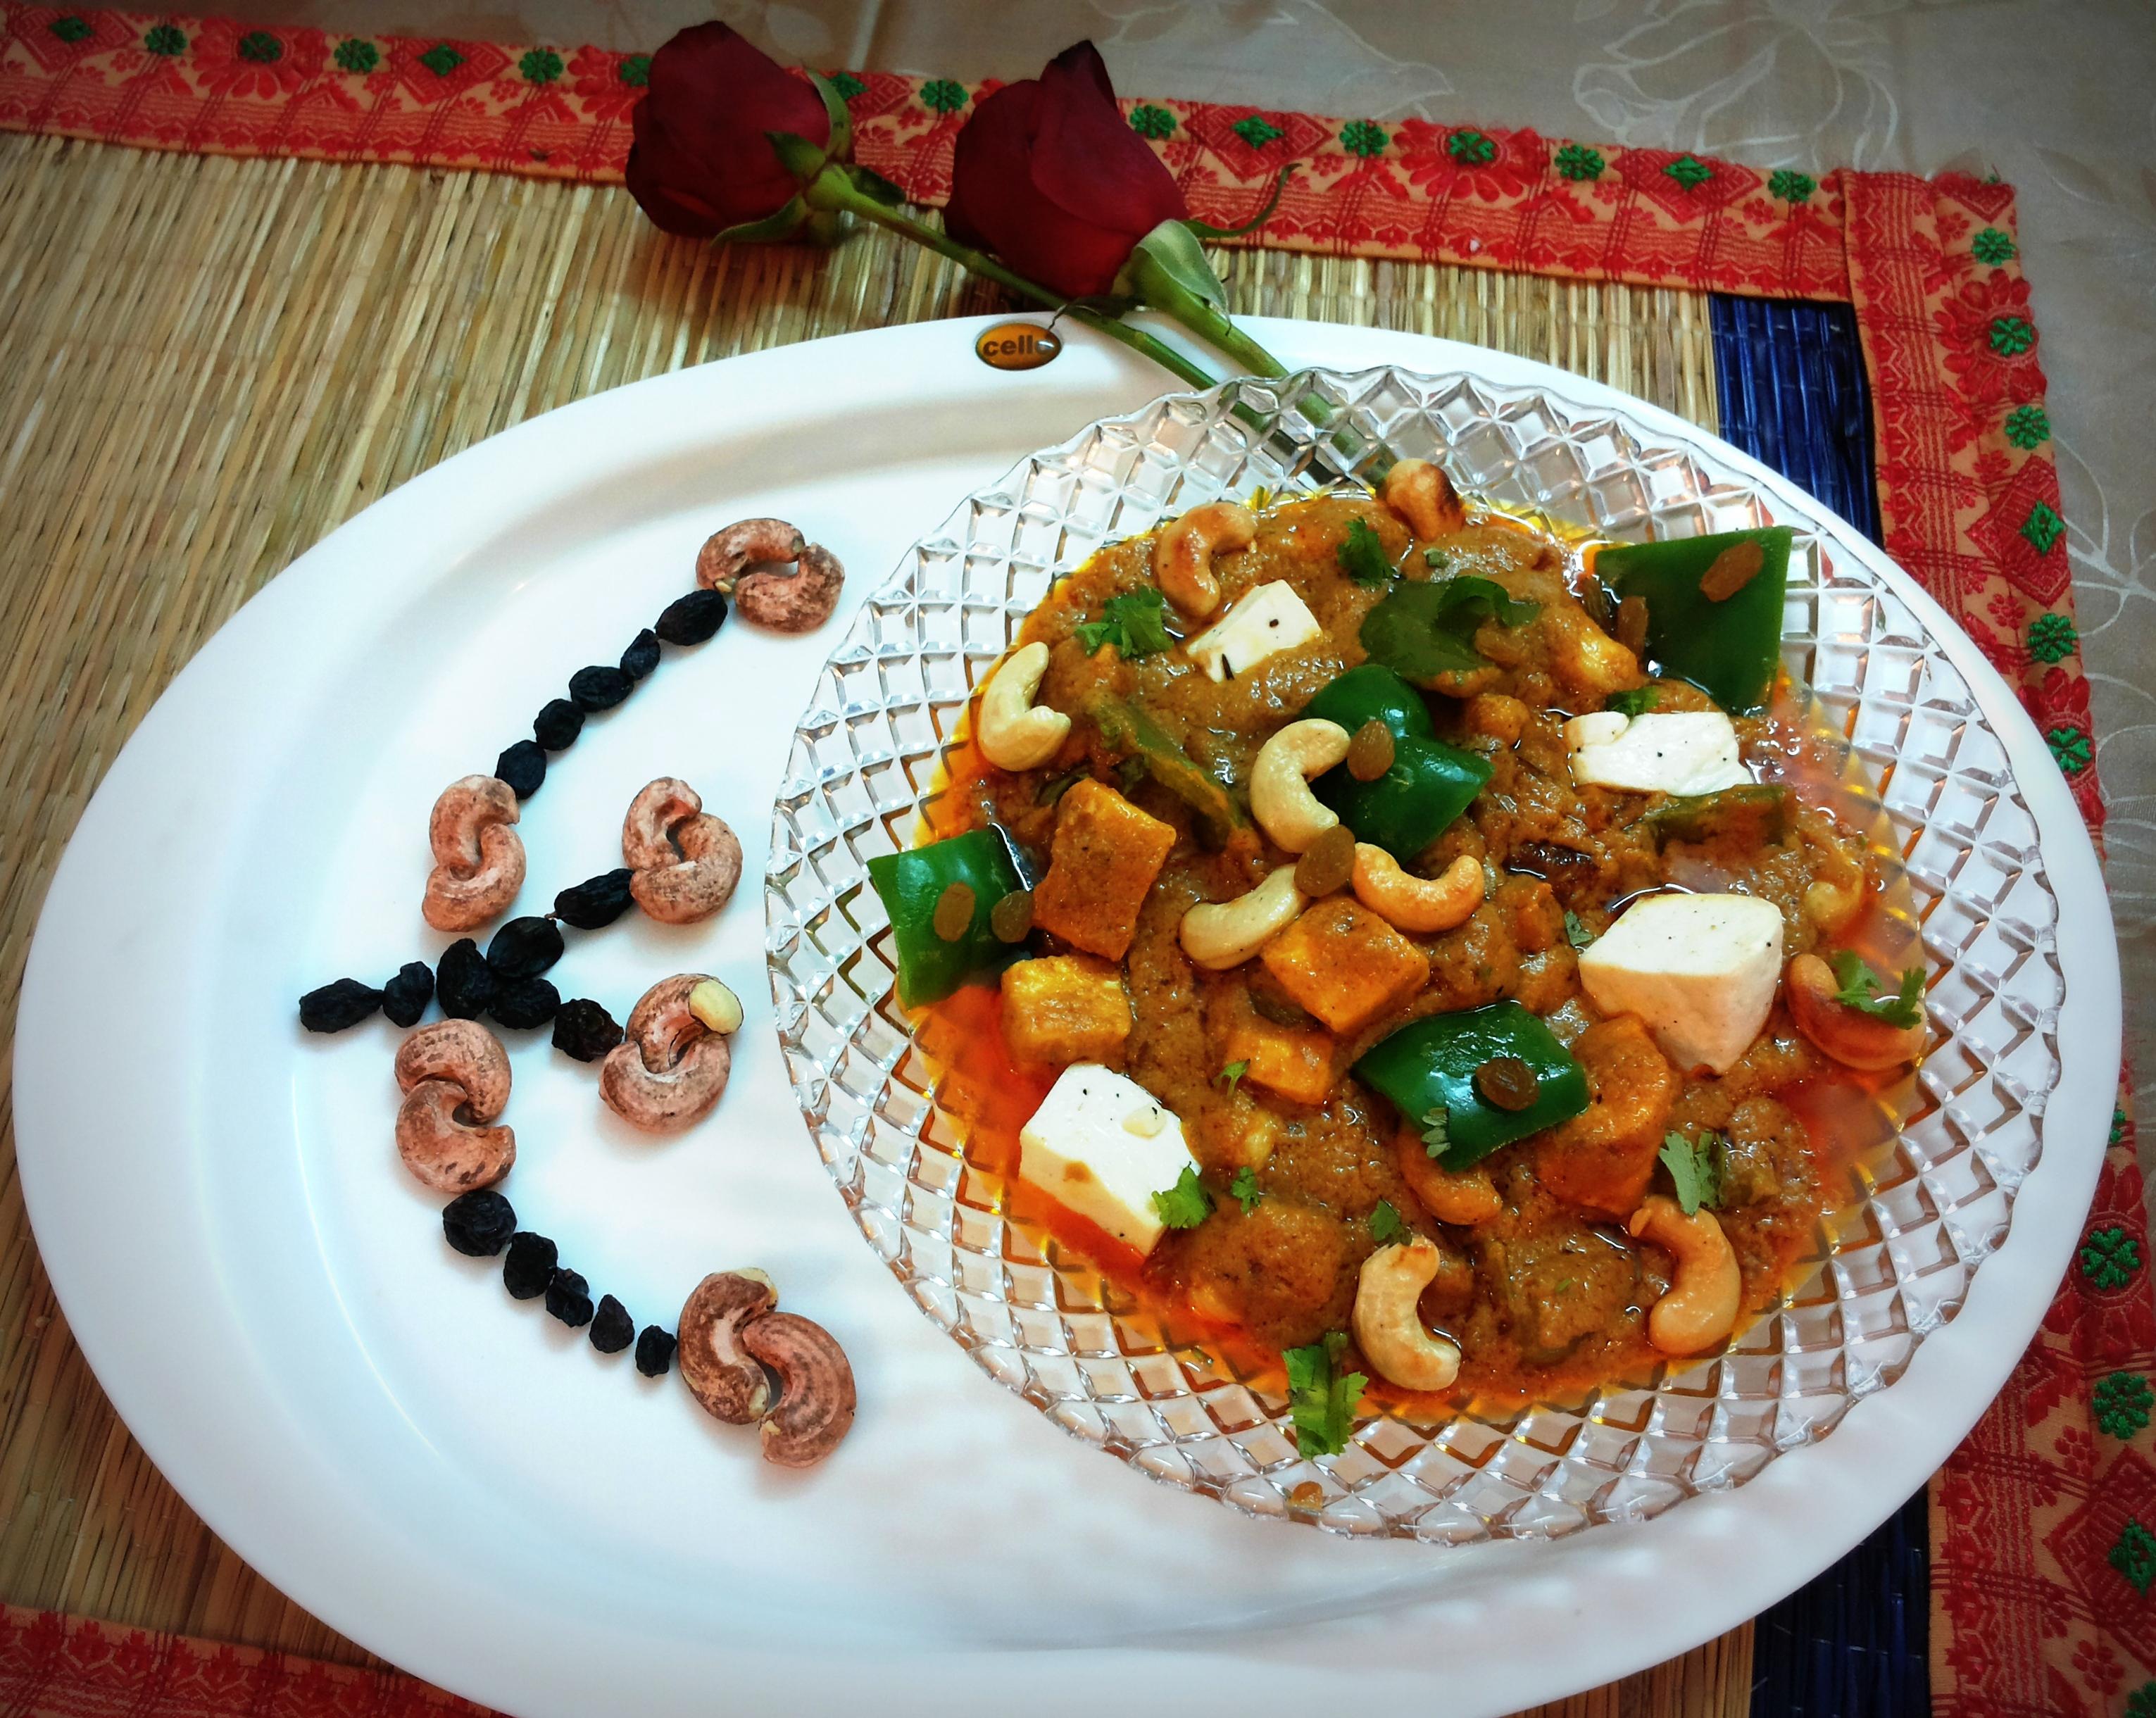 Shahi (Royal) paneer (cottage cheese/fresh cheese) masala